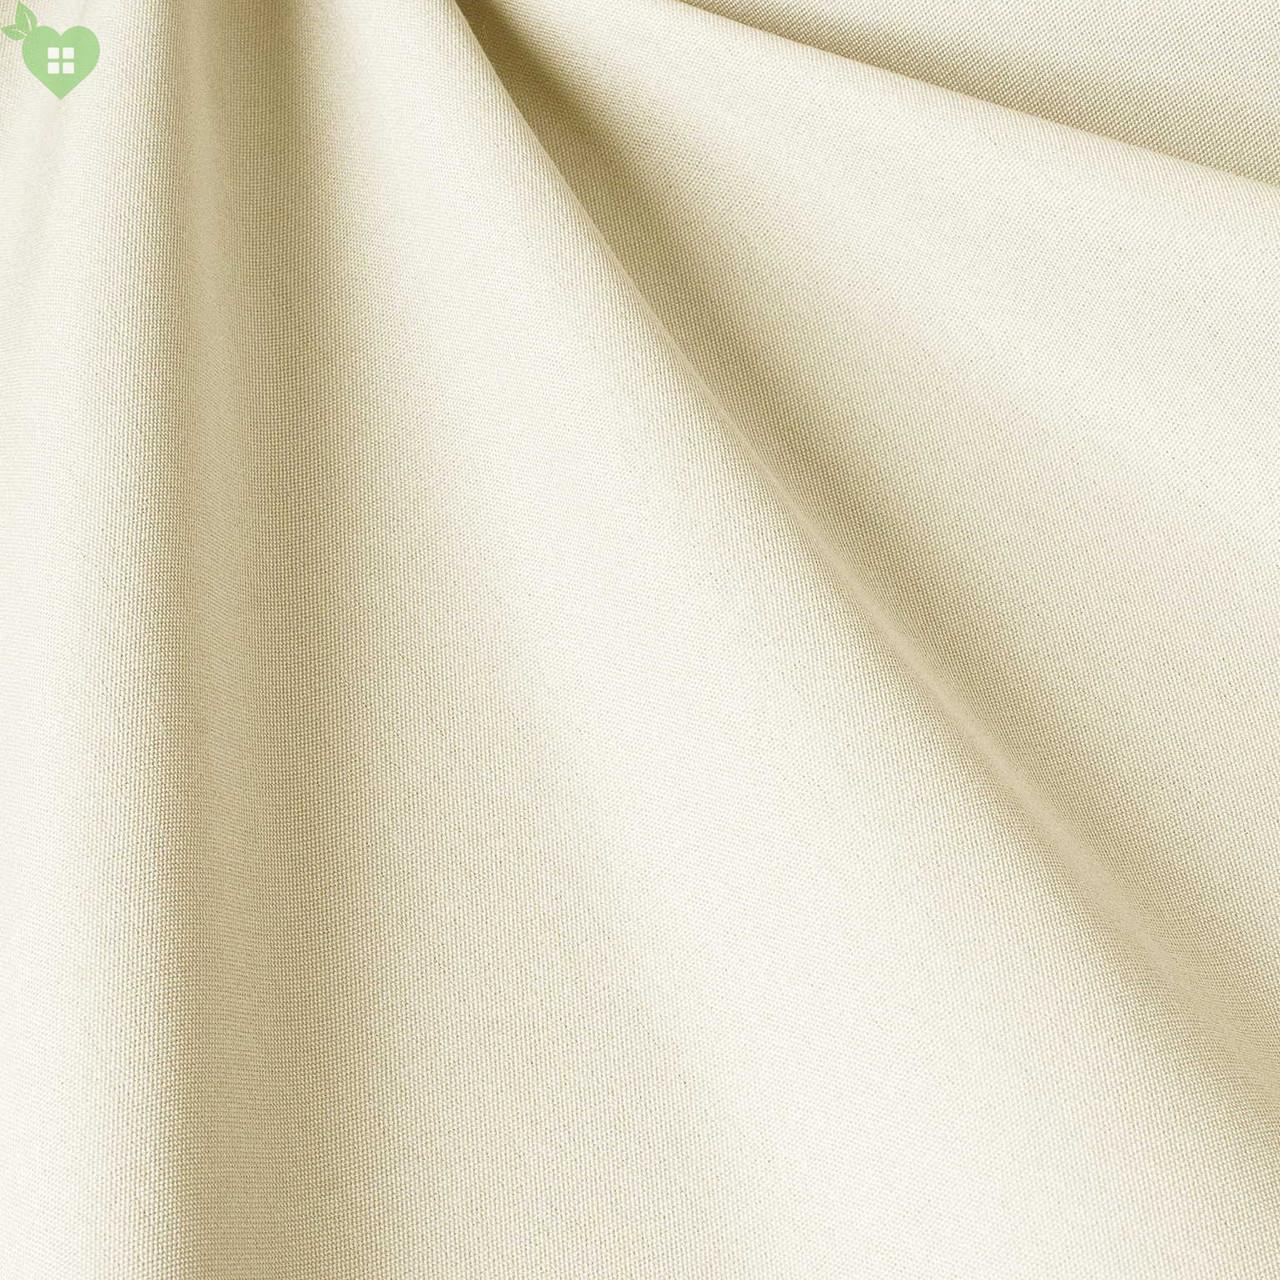 Ткань для улицы: Дралон (Outdoor) 83381v9